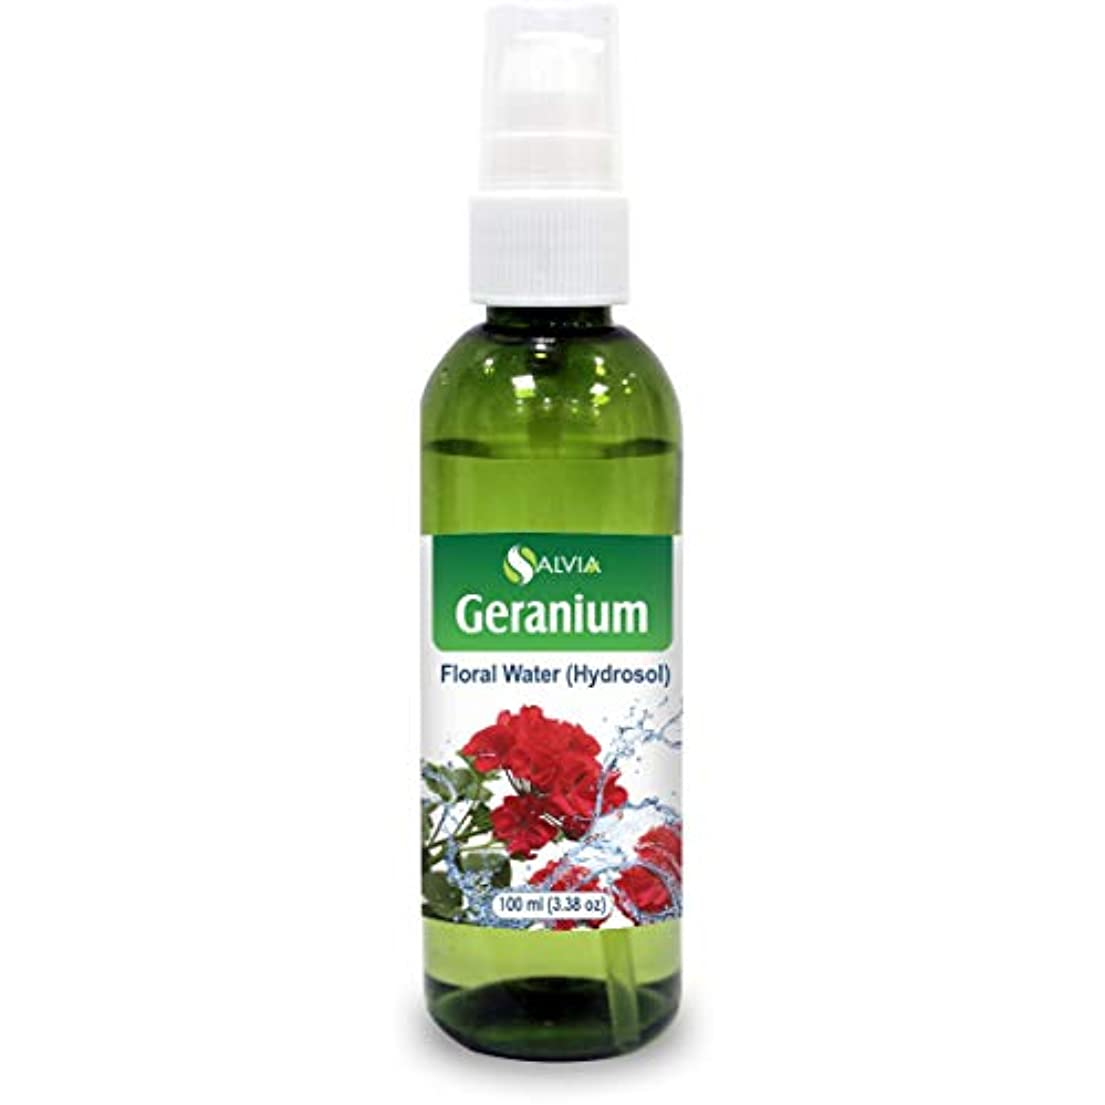 用語集温度計同情的Geranium Floral Water 100ml (Hydrosol) 100% Pure And Natural